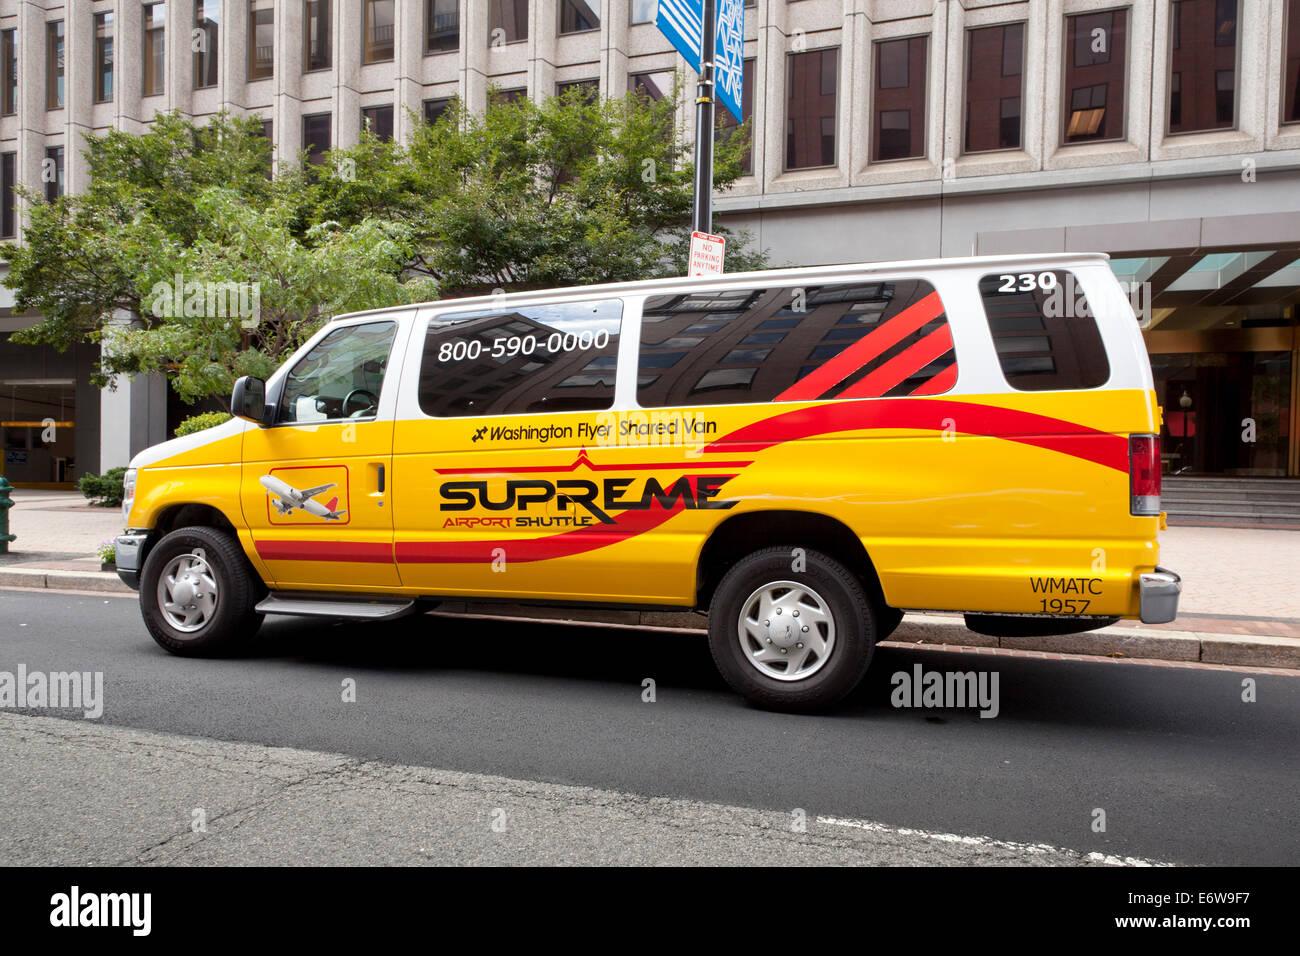 Supreme Airport Shuttle Bus Washington Dc Usa Stock Image